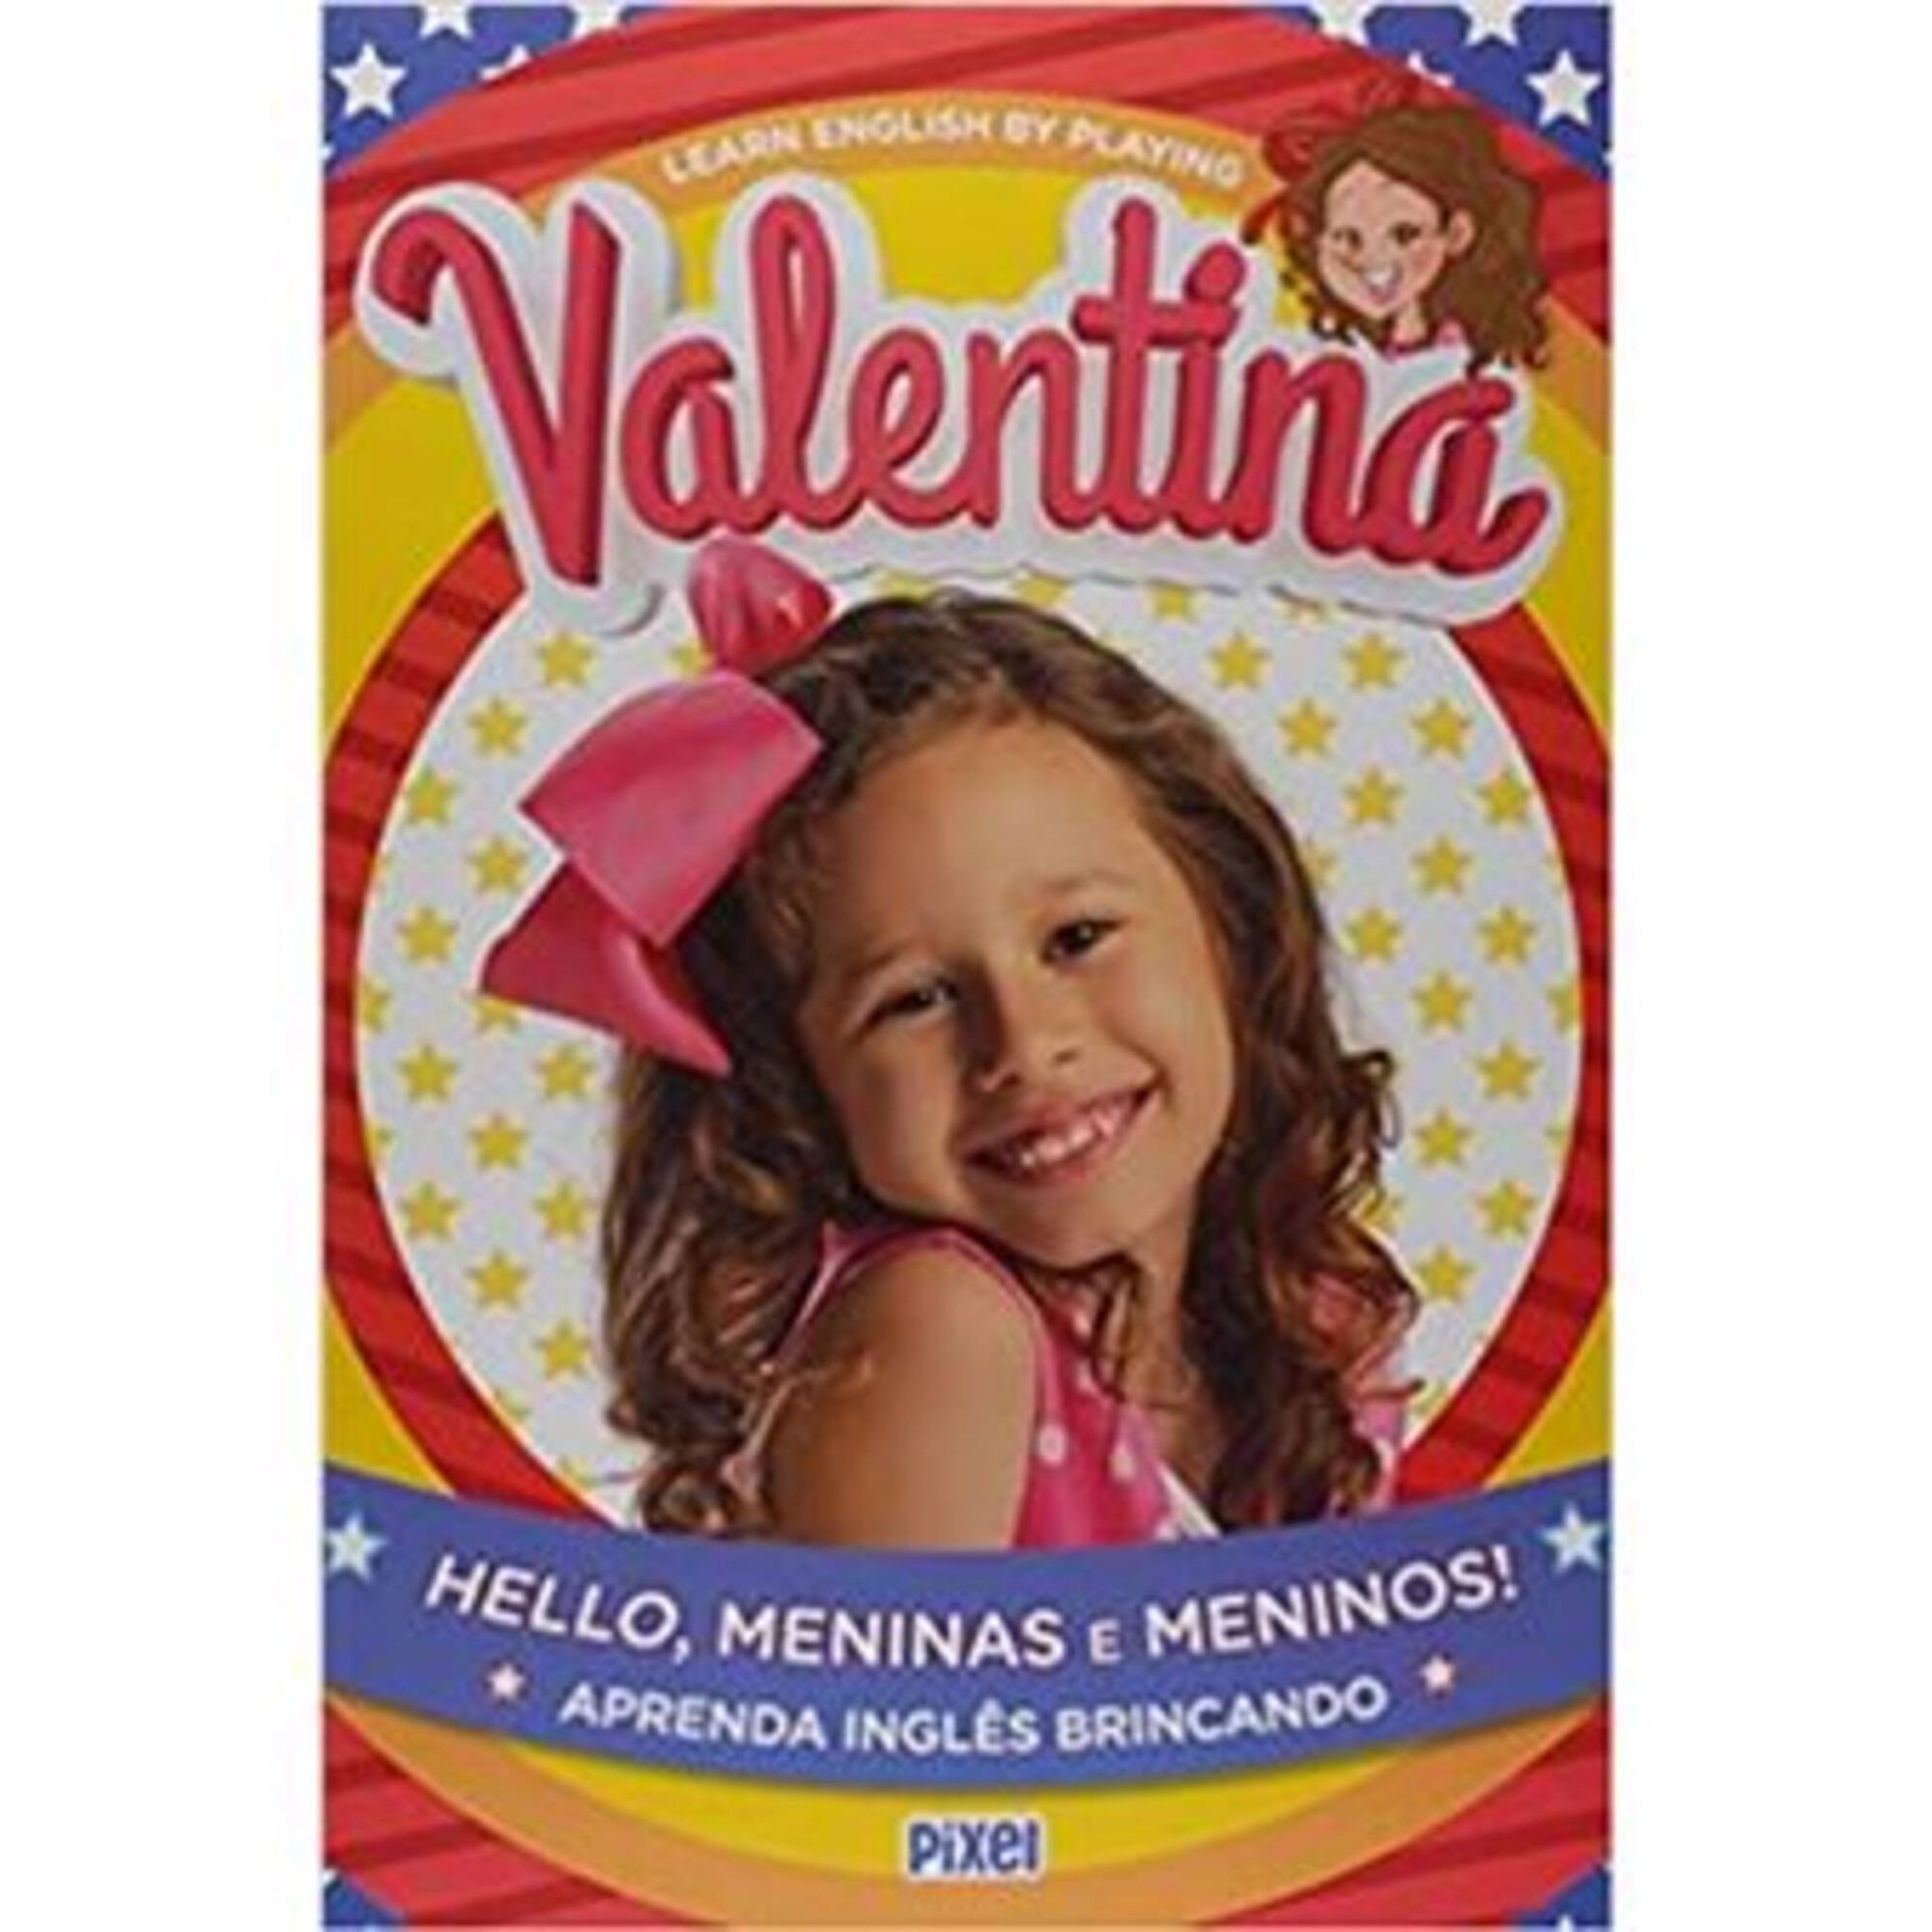 Hello, Meninas e Meninos!